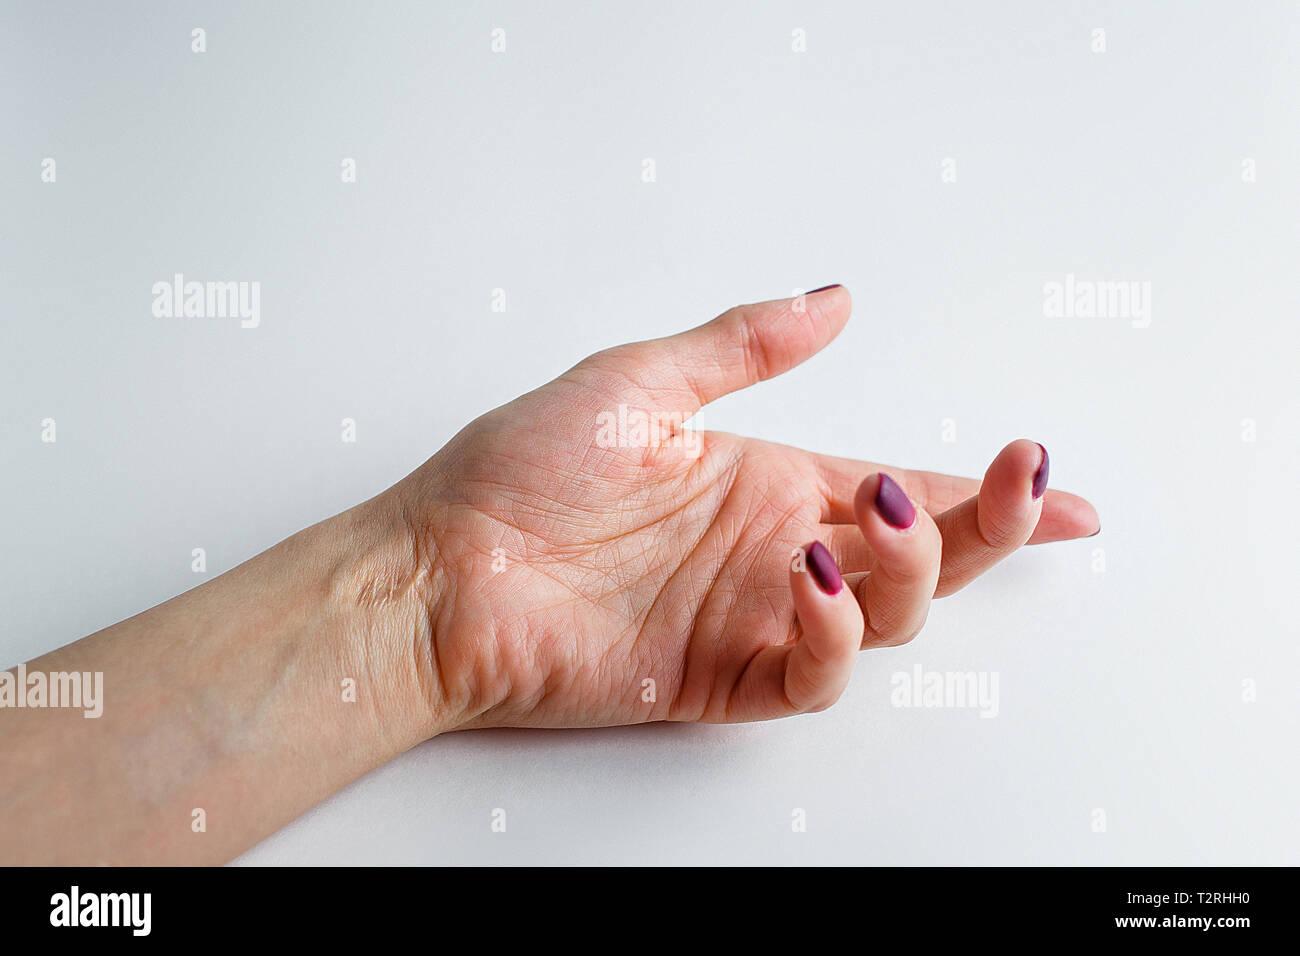 Arm Scar Stock Photos & Arm Scar Stock Images - Alamy